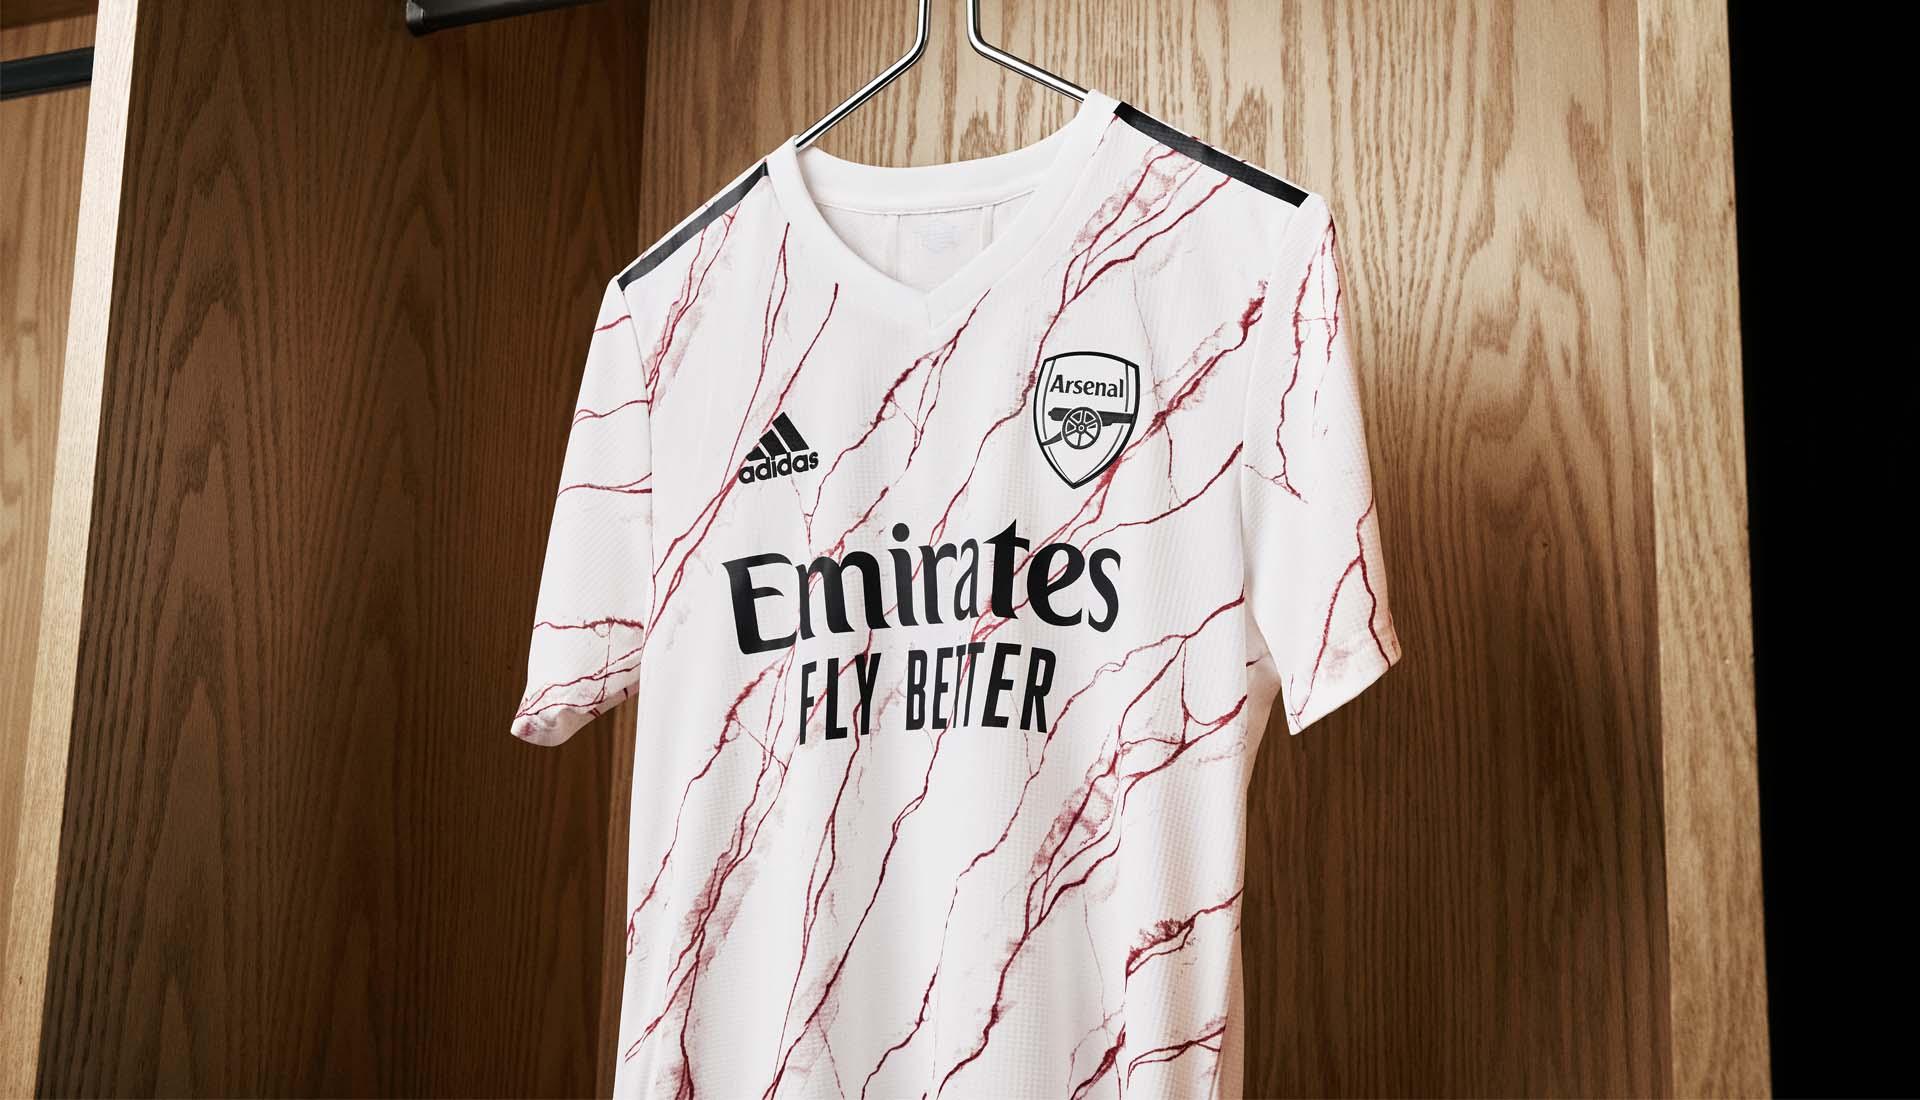 Adidas Product Designer James Webb On Arsenal 20 21 Away Shirt Soccerbible